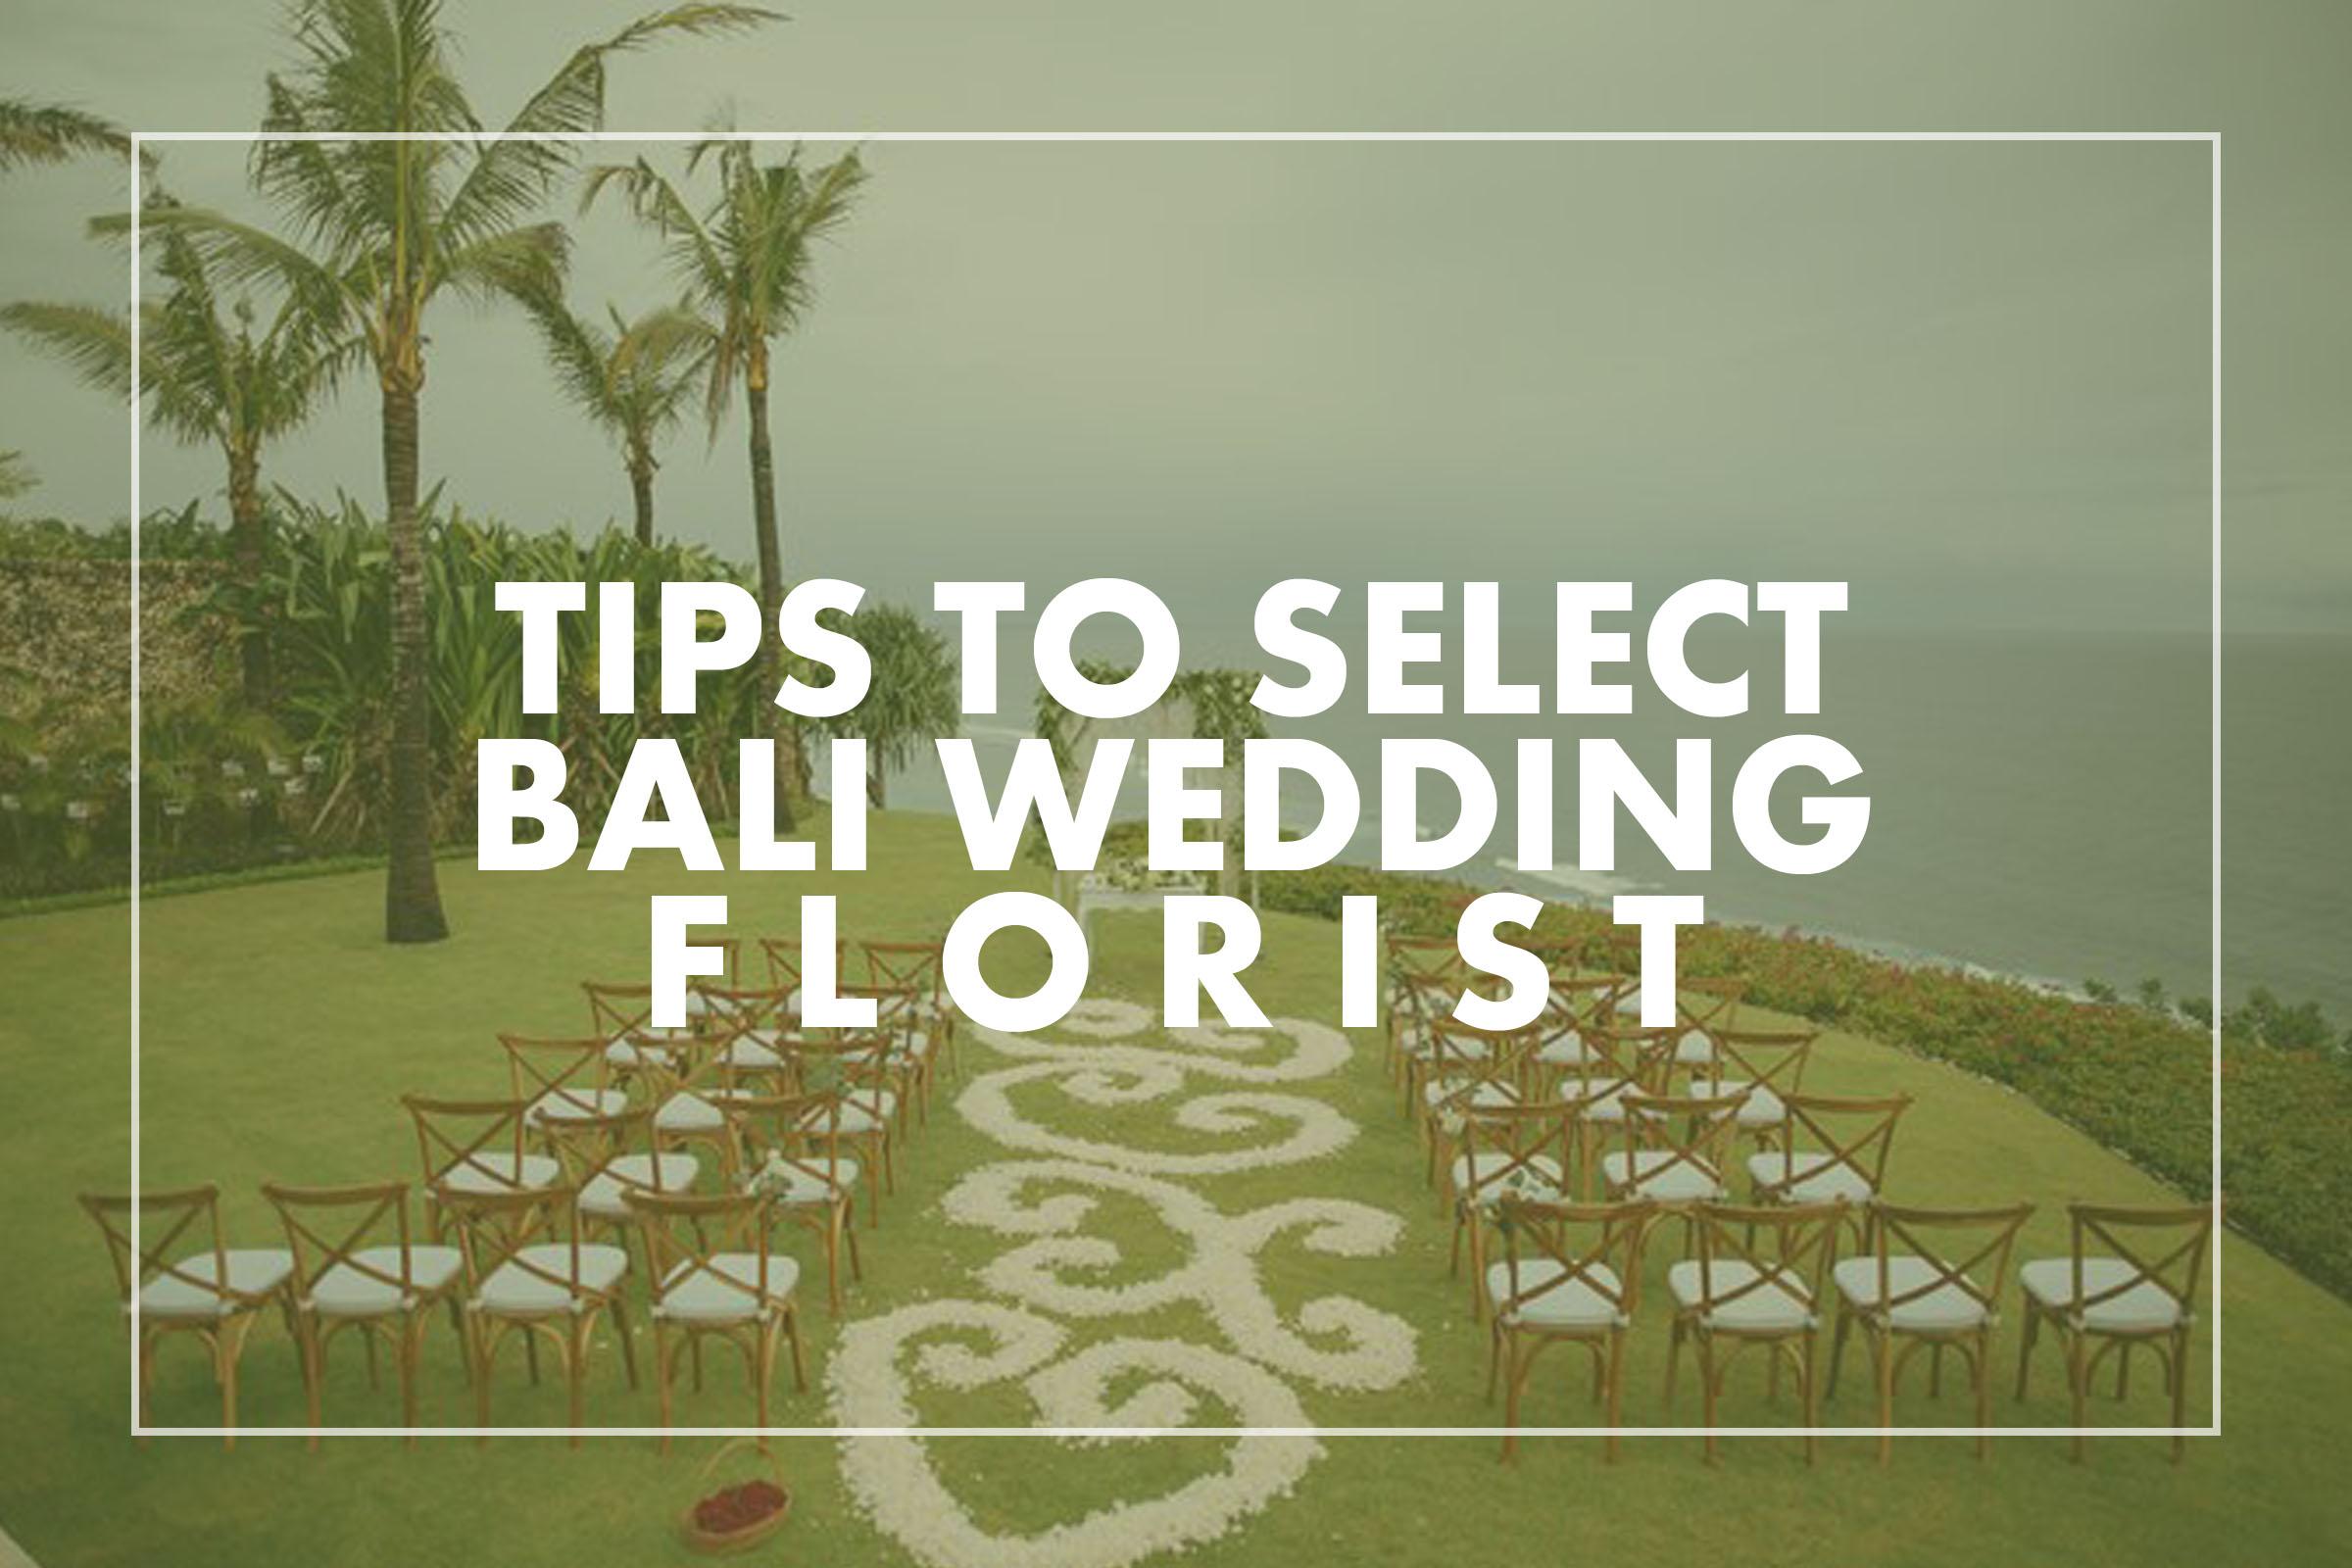 Bali Wedding Florist